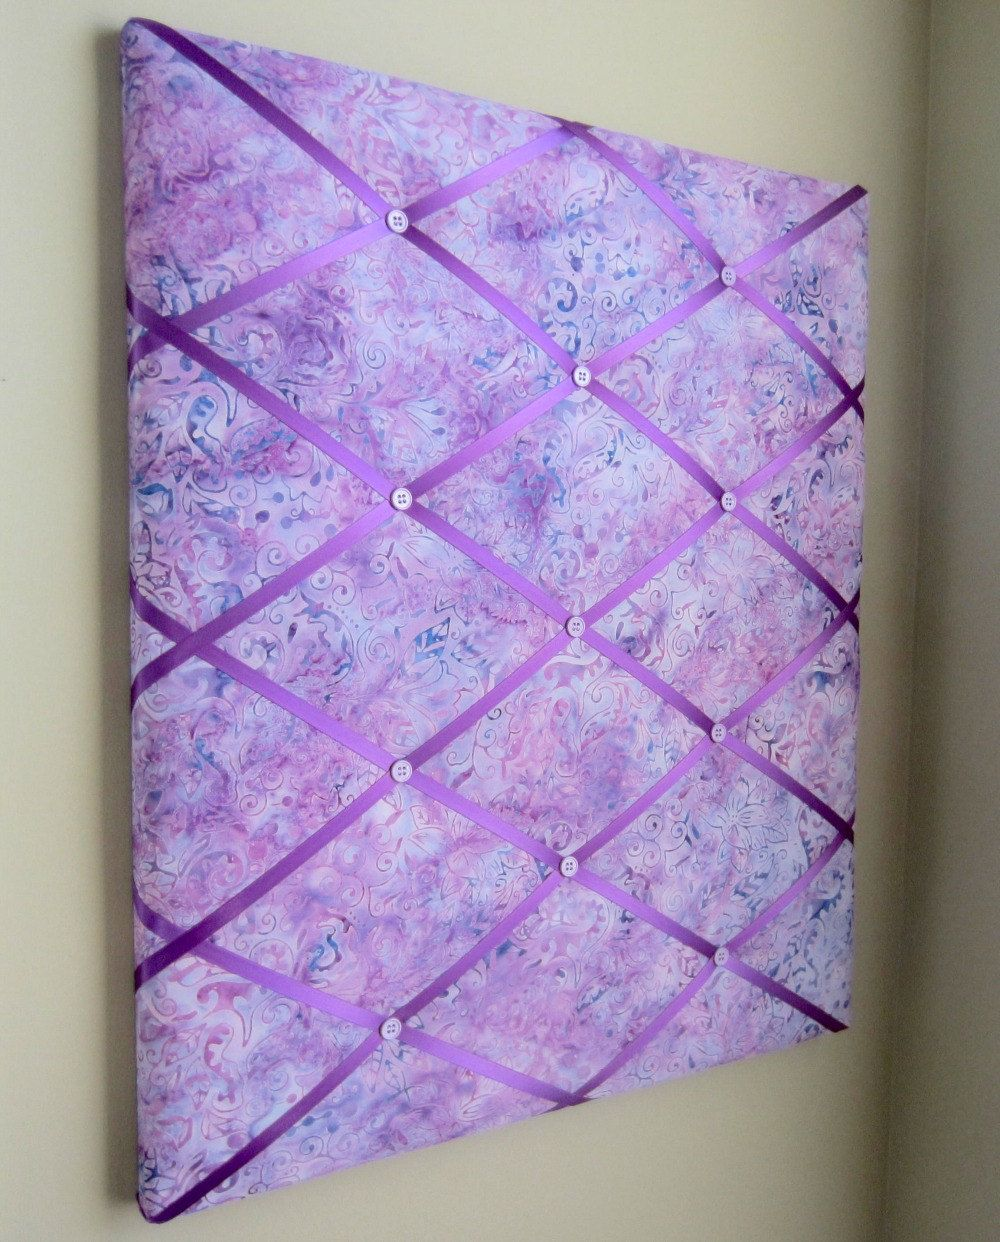 20x24 Radiant Orchid Lilac Batik Ribbon Memory Board French Memo